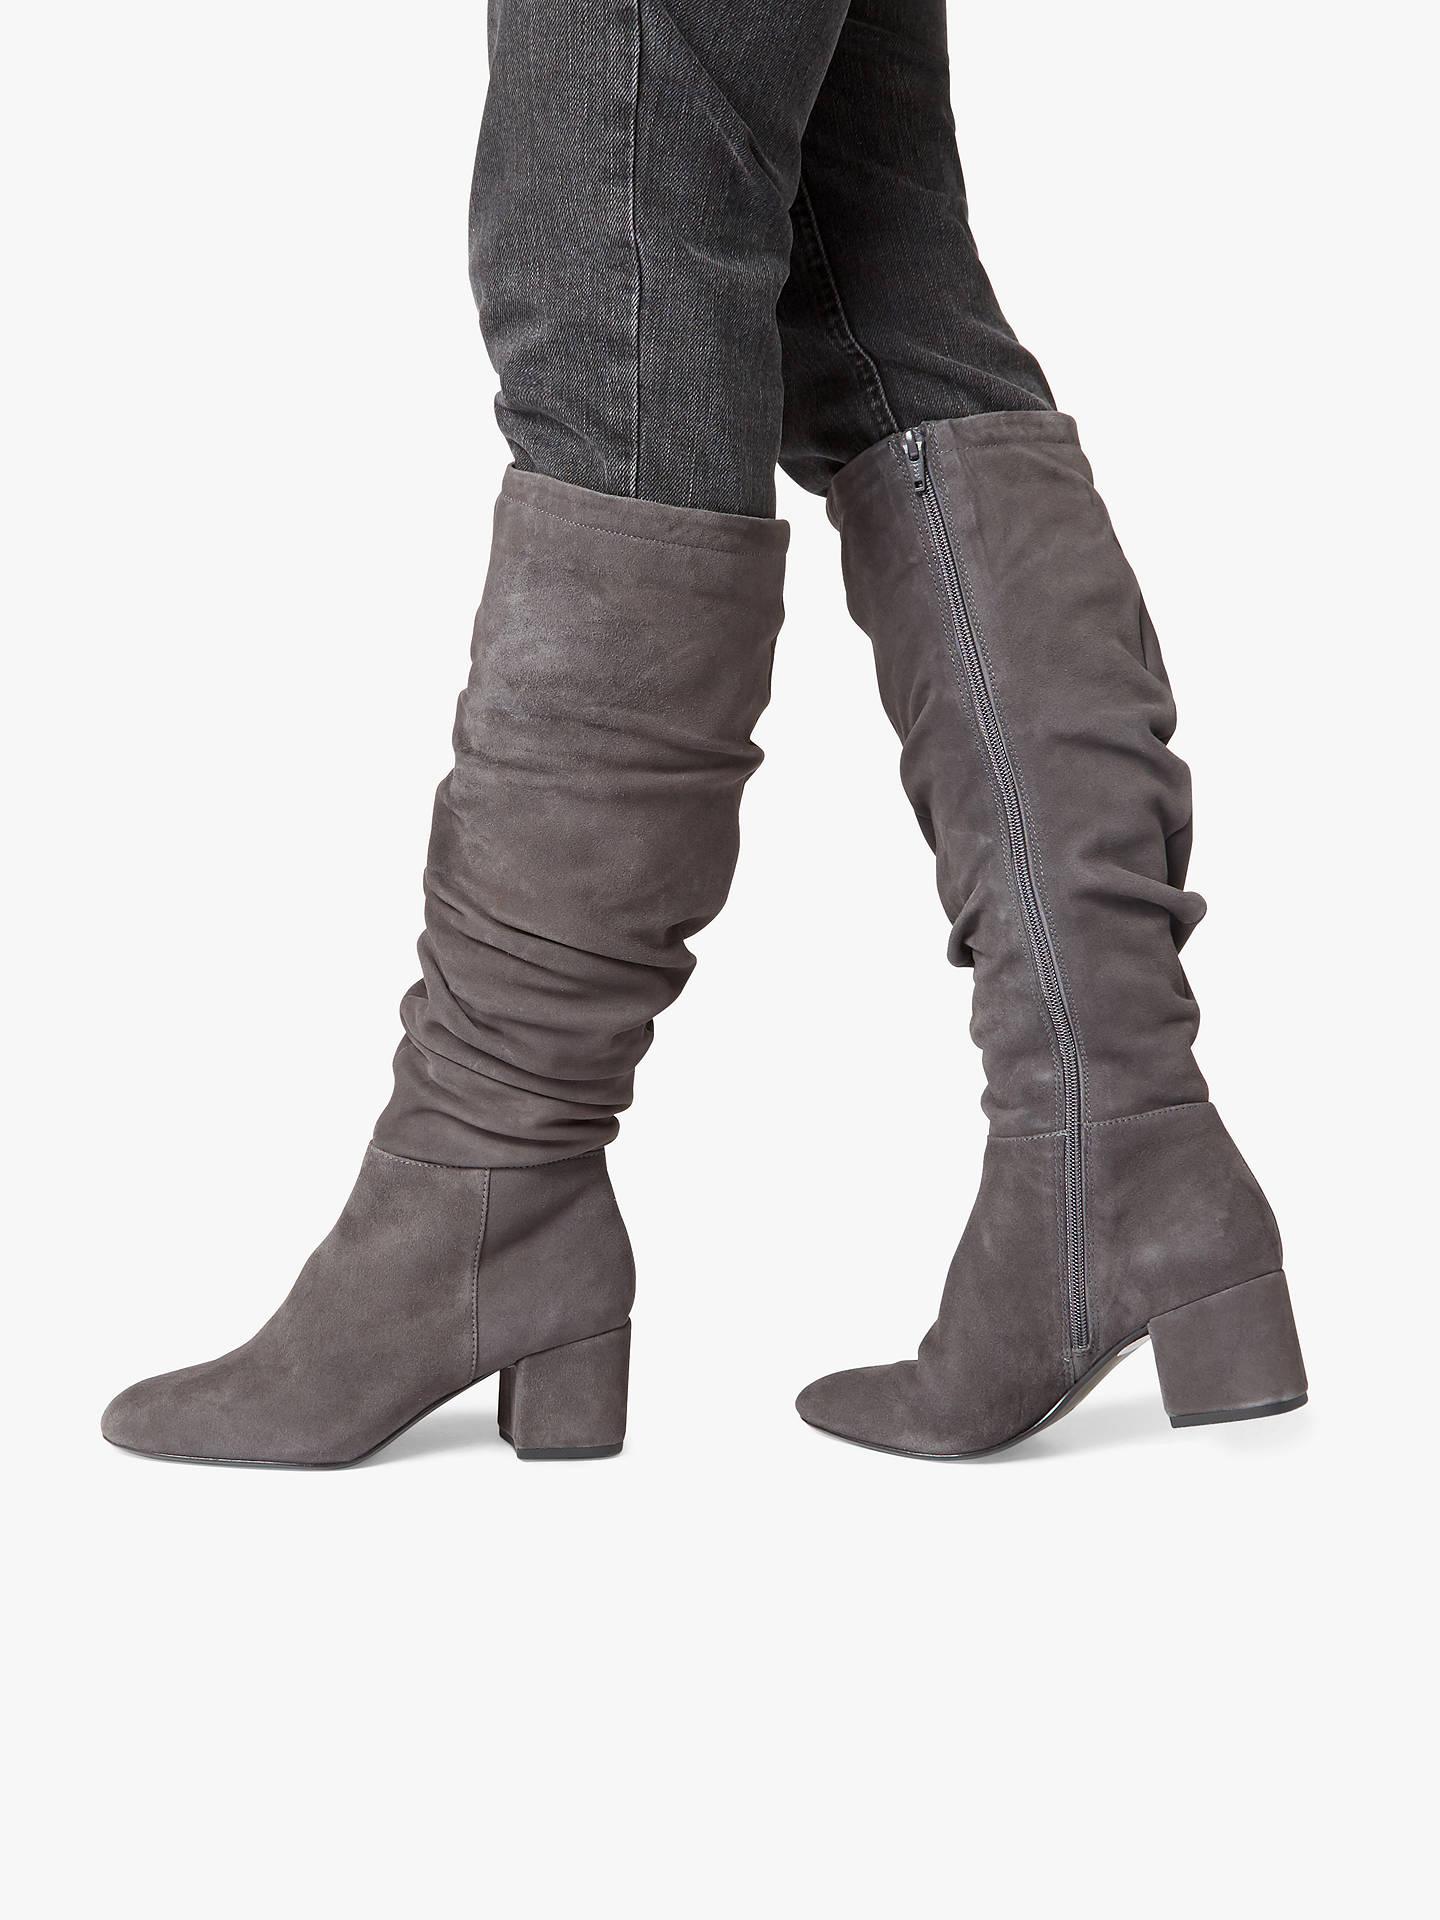 16ca1b21efe Dune Sarento Ruched Knee High Boots, Grey Suede